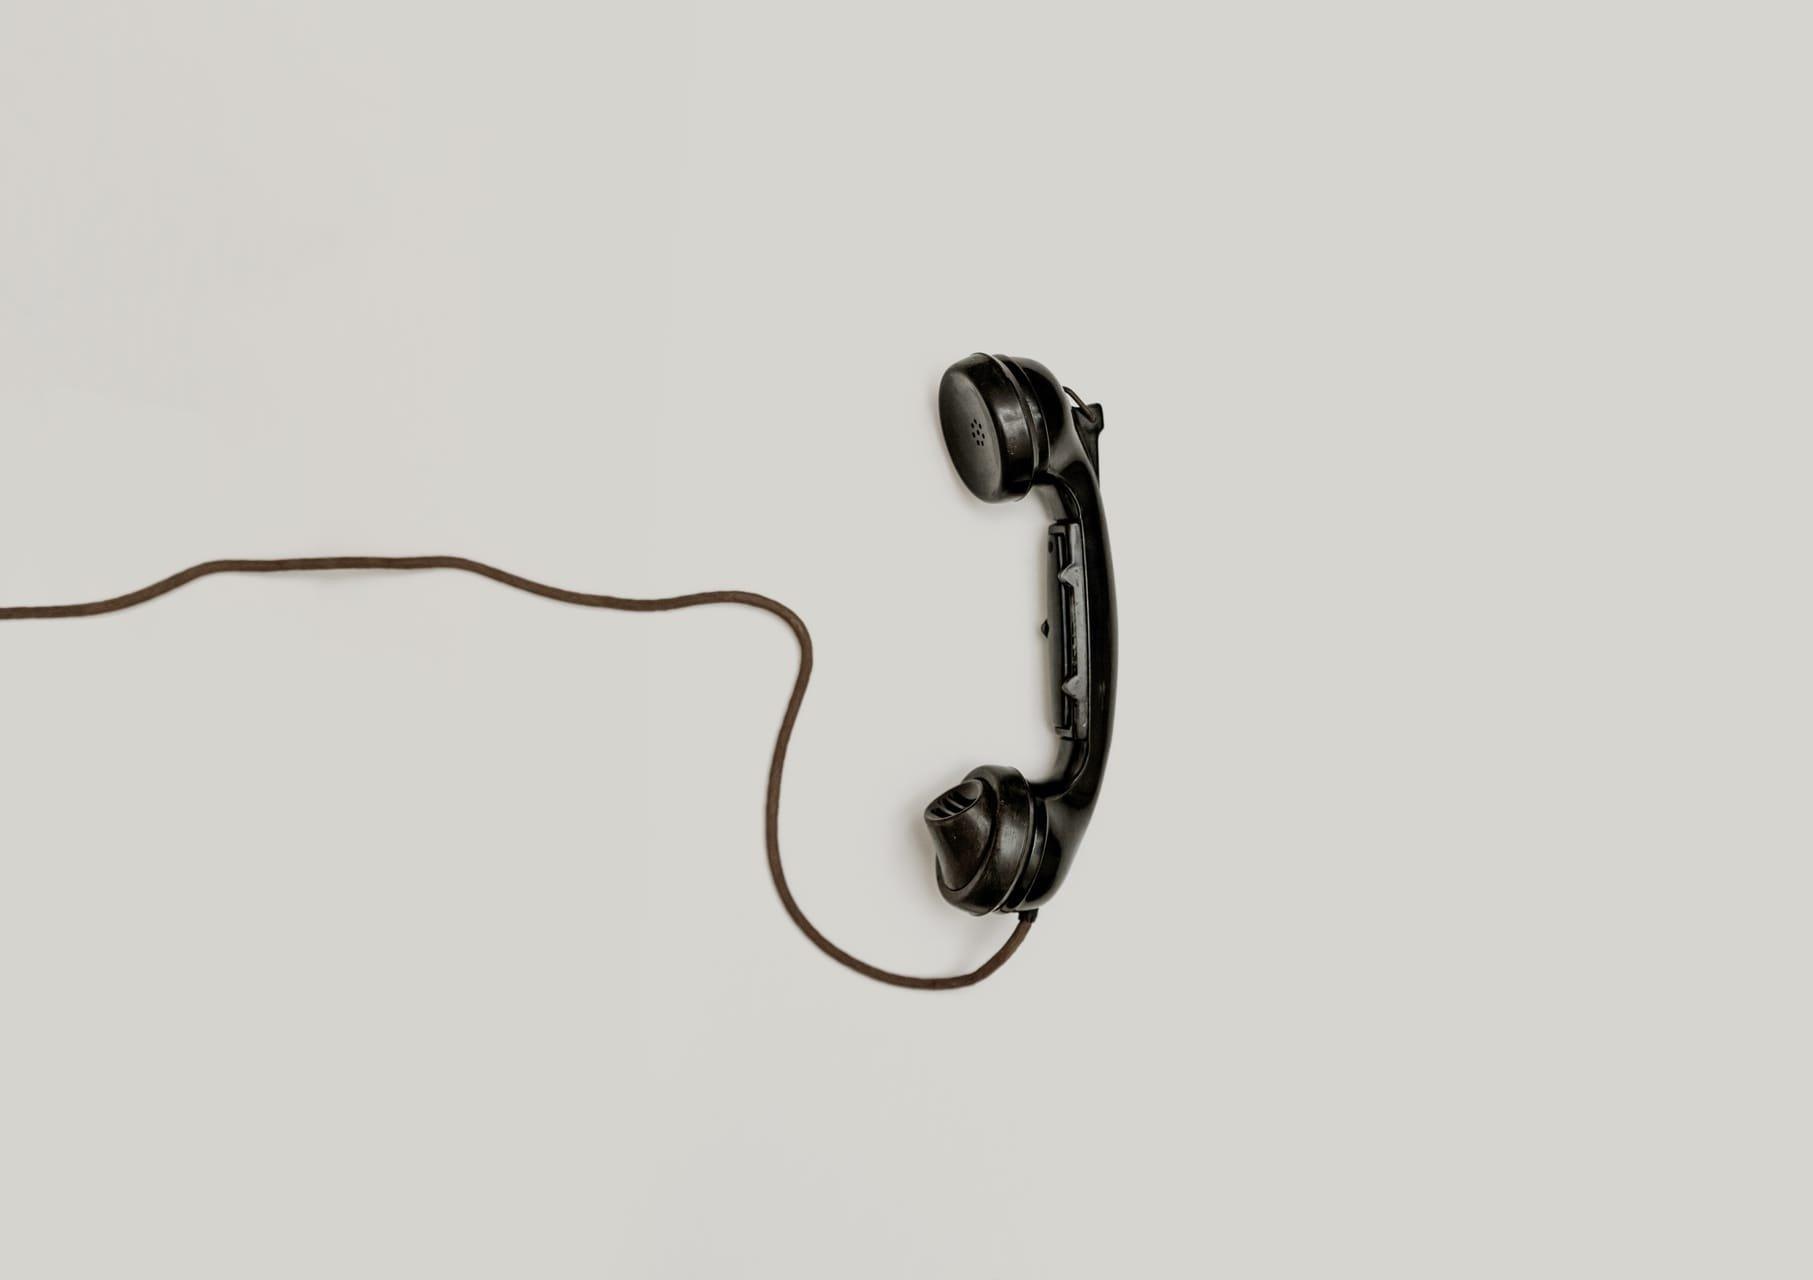 black-landline-phone